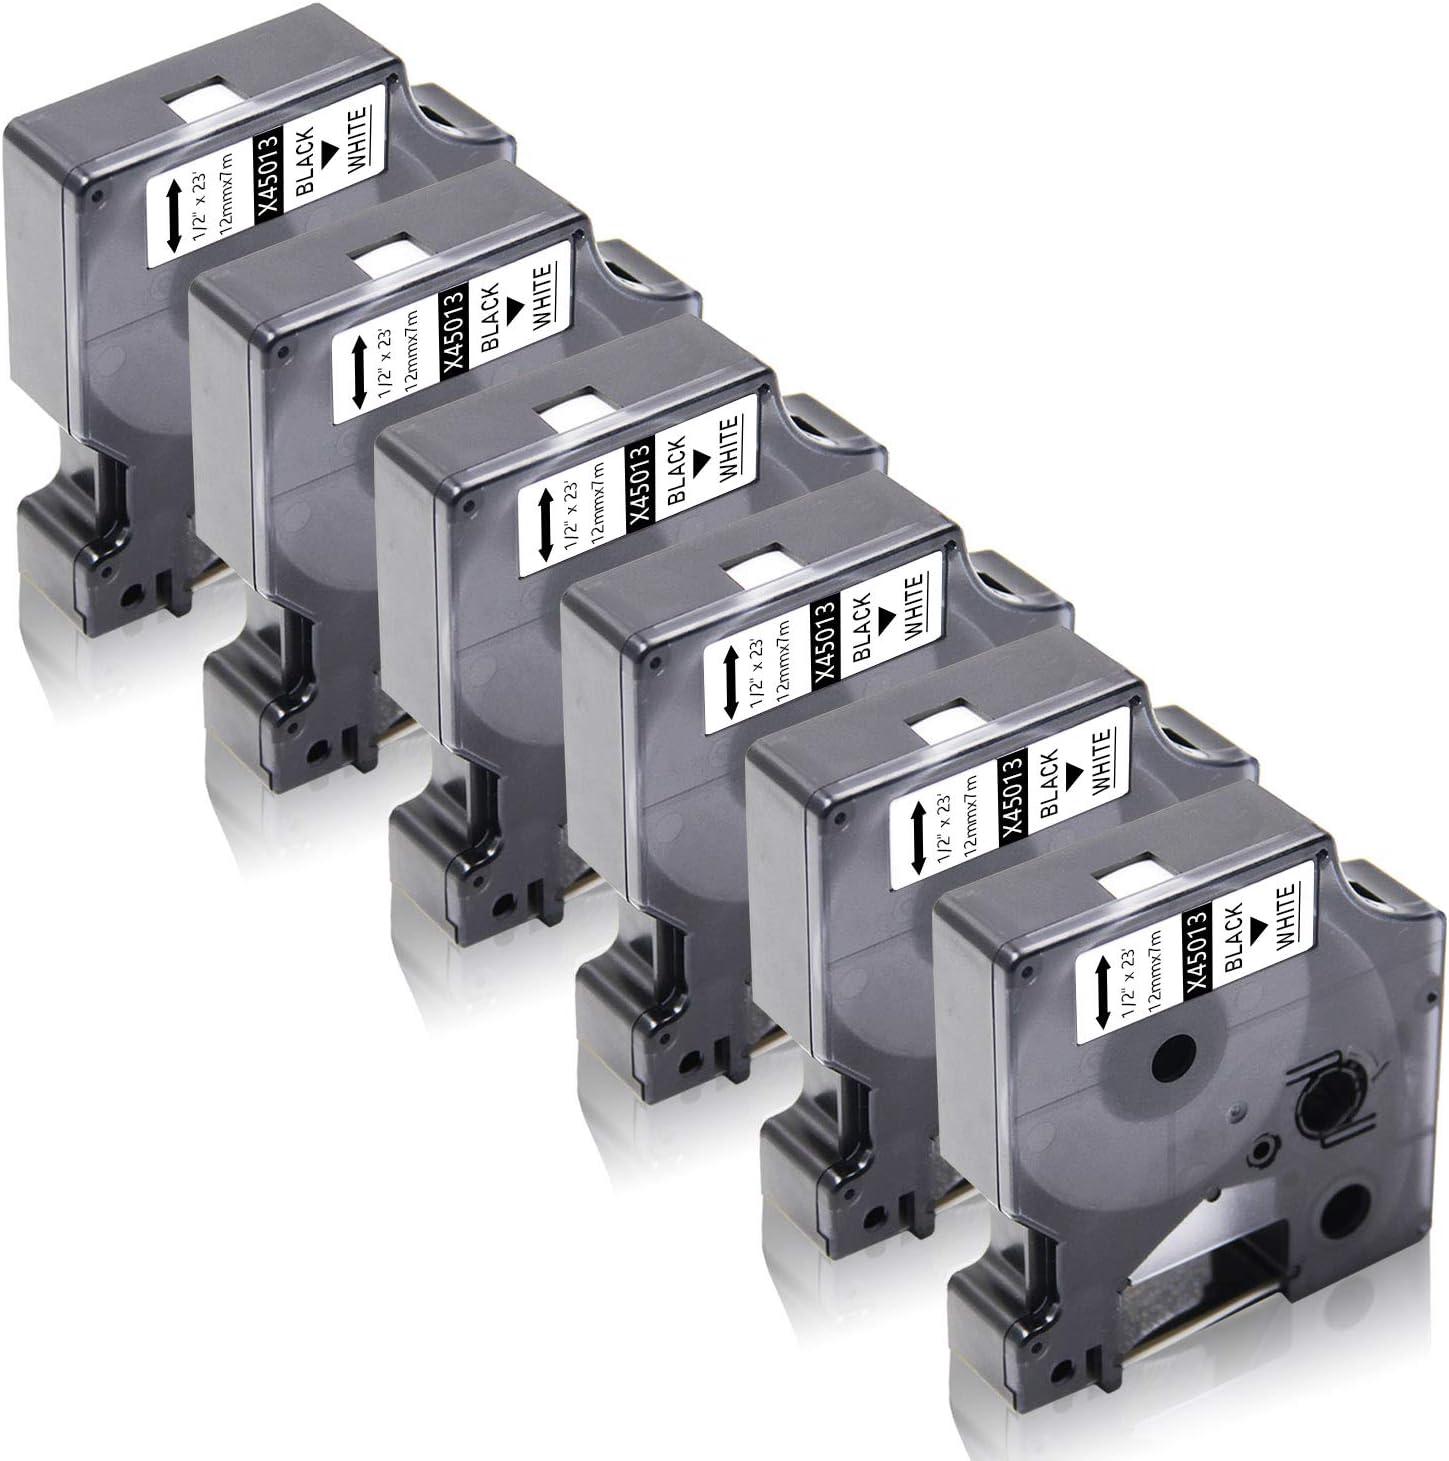 12mm x 7m Cassetta Nastro per DYMO/LabelWriter 450 Duo LabelPoint 100 150 250 LabelManager 160 210D 220P 260P 280 360D 420P 450 500TS PnP MobileLabeler 5x Compatibile D1 45013 Nero su Bianco